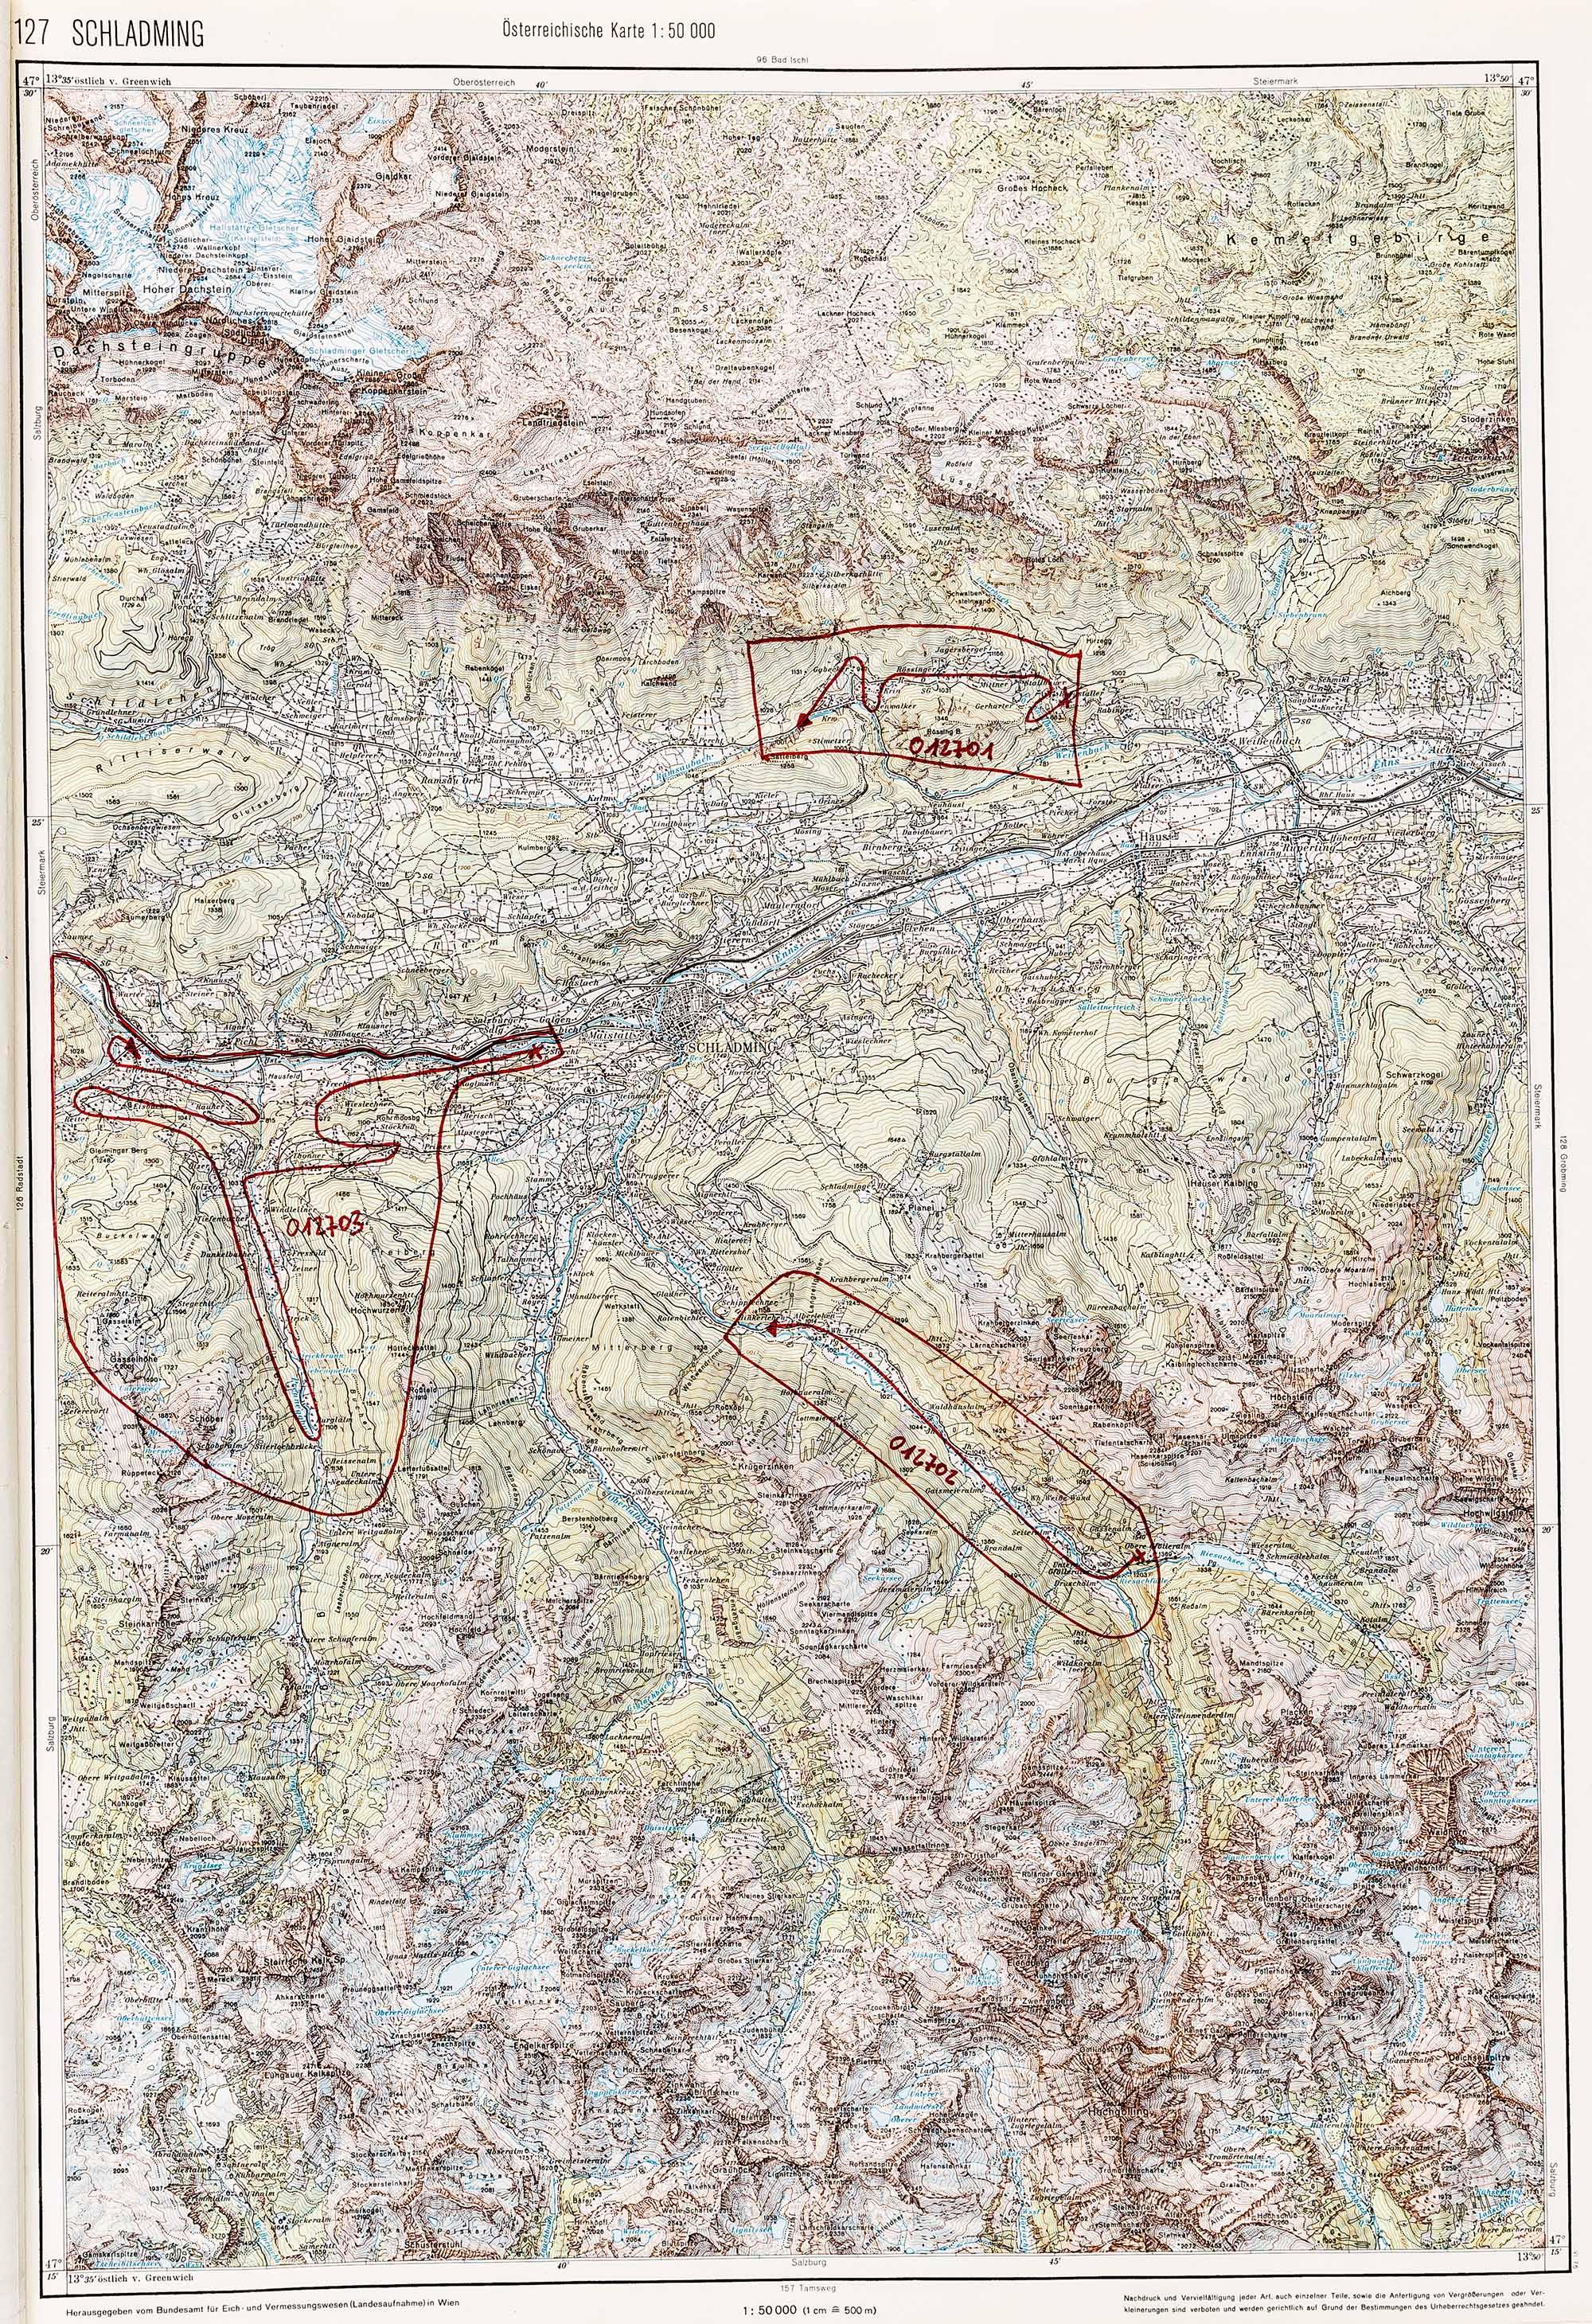 1979-1982 Karte 127